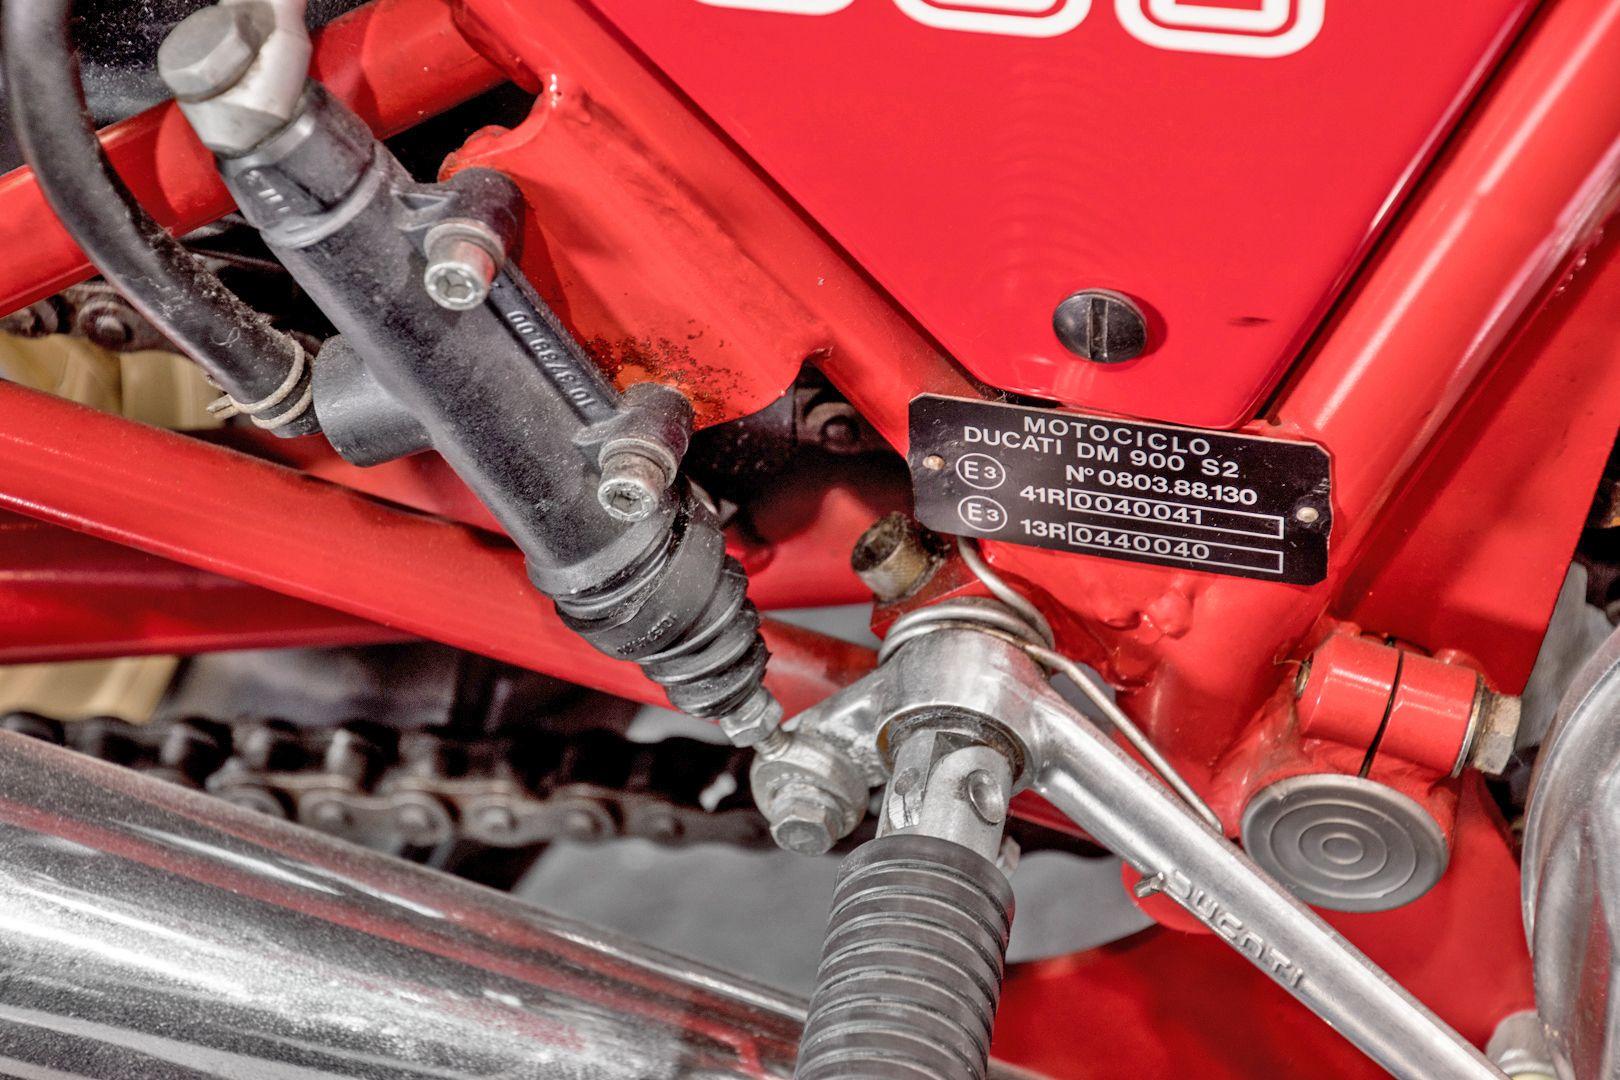 1984 Ducati 900 Mike Hailwood Replica 81563